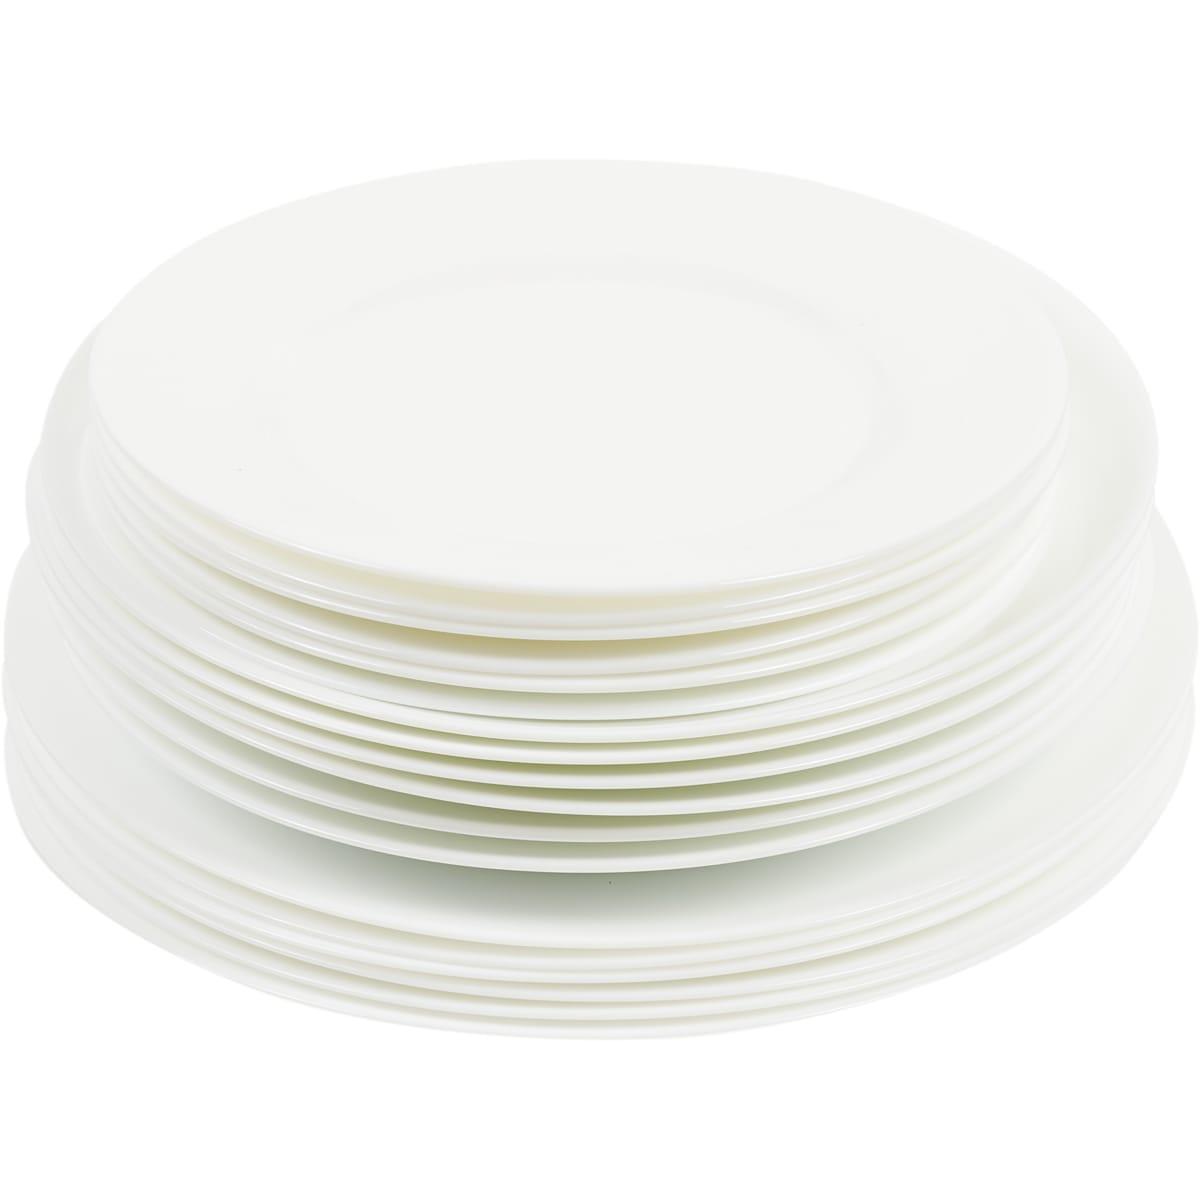 Набор посуды Every Day, 18 шт.